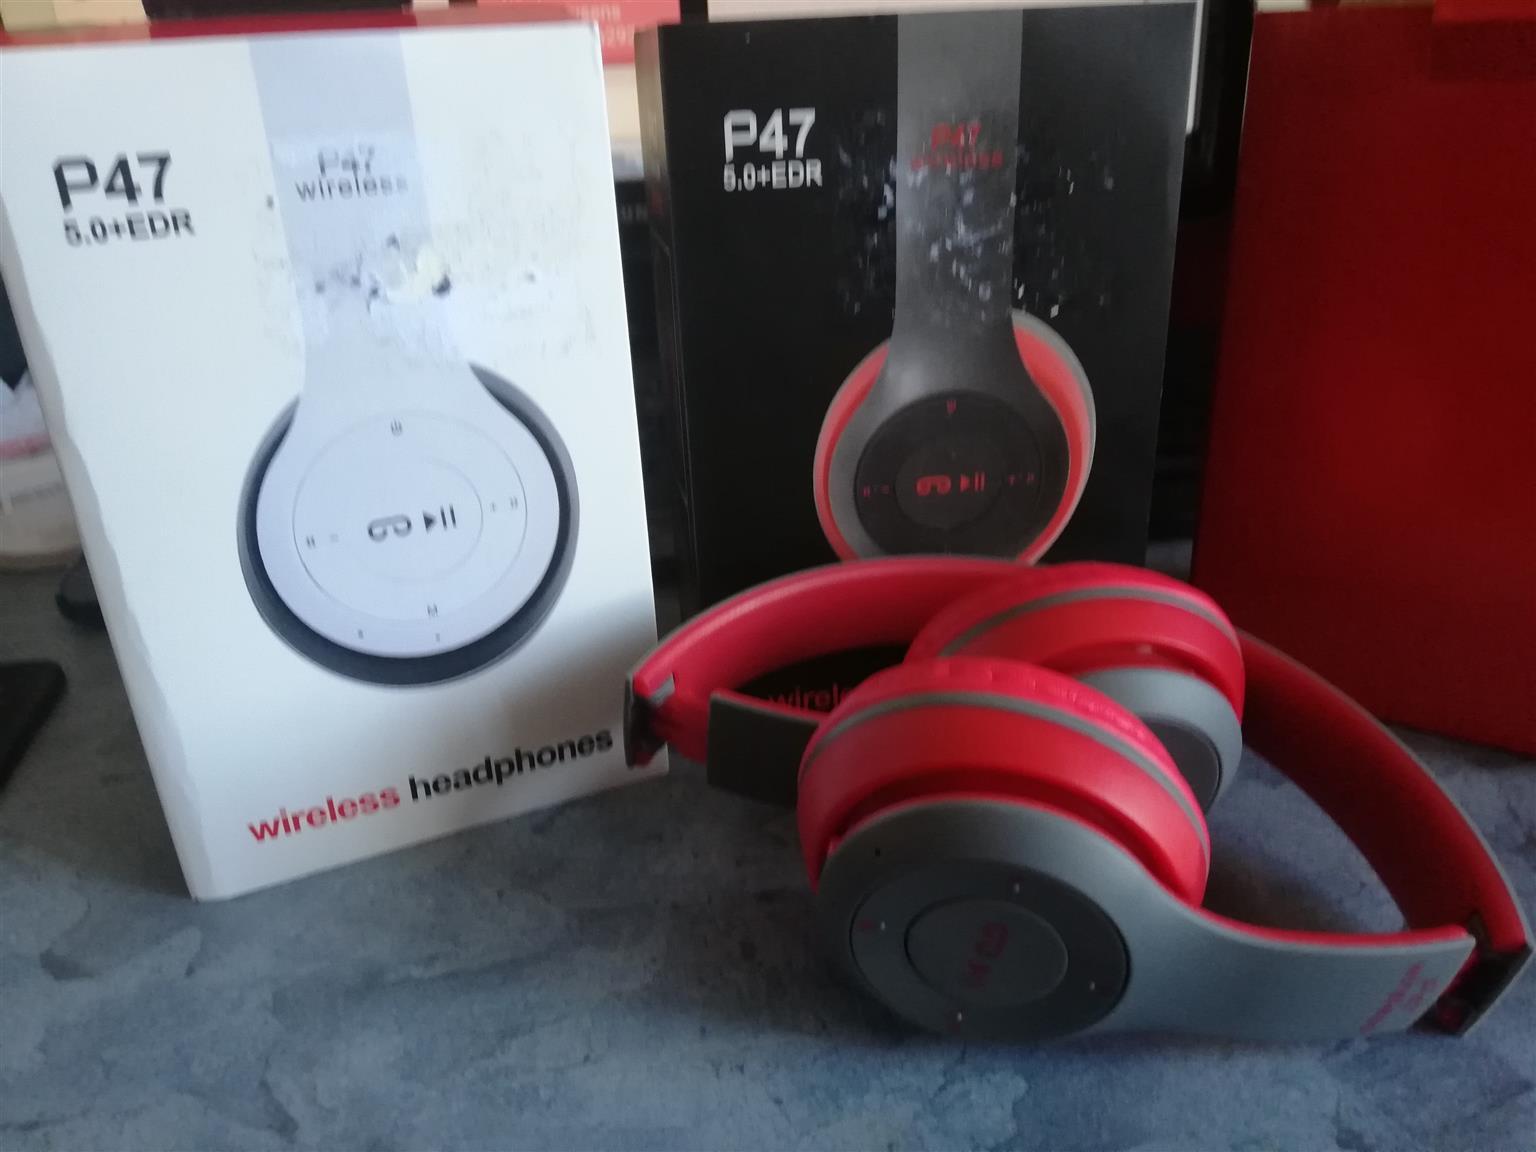 P47 Wireless (bluetooth) Headphones